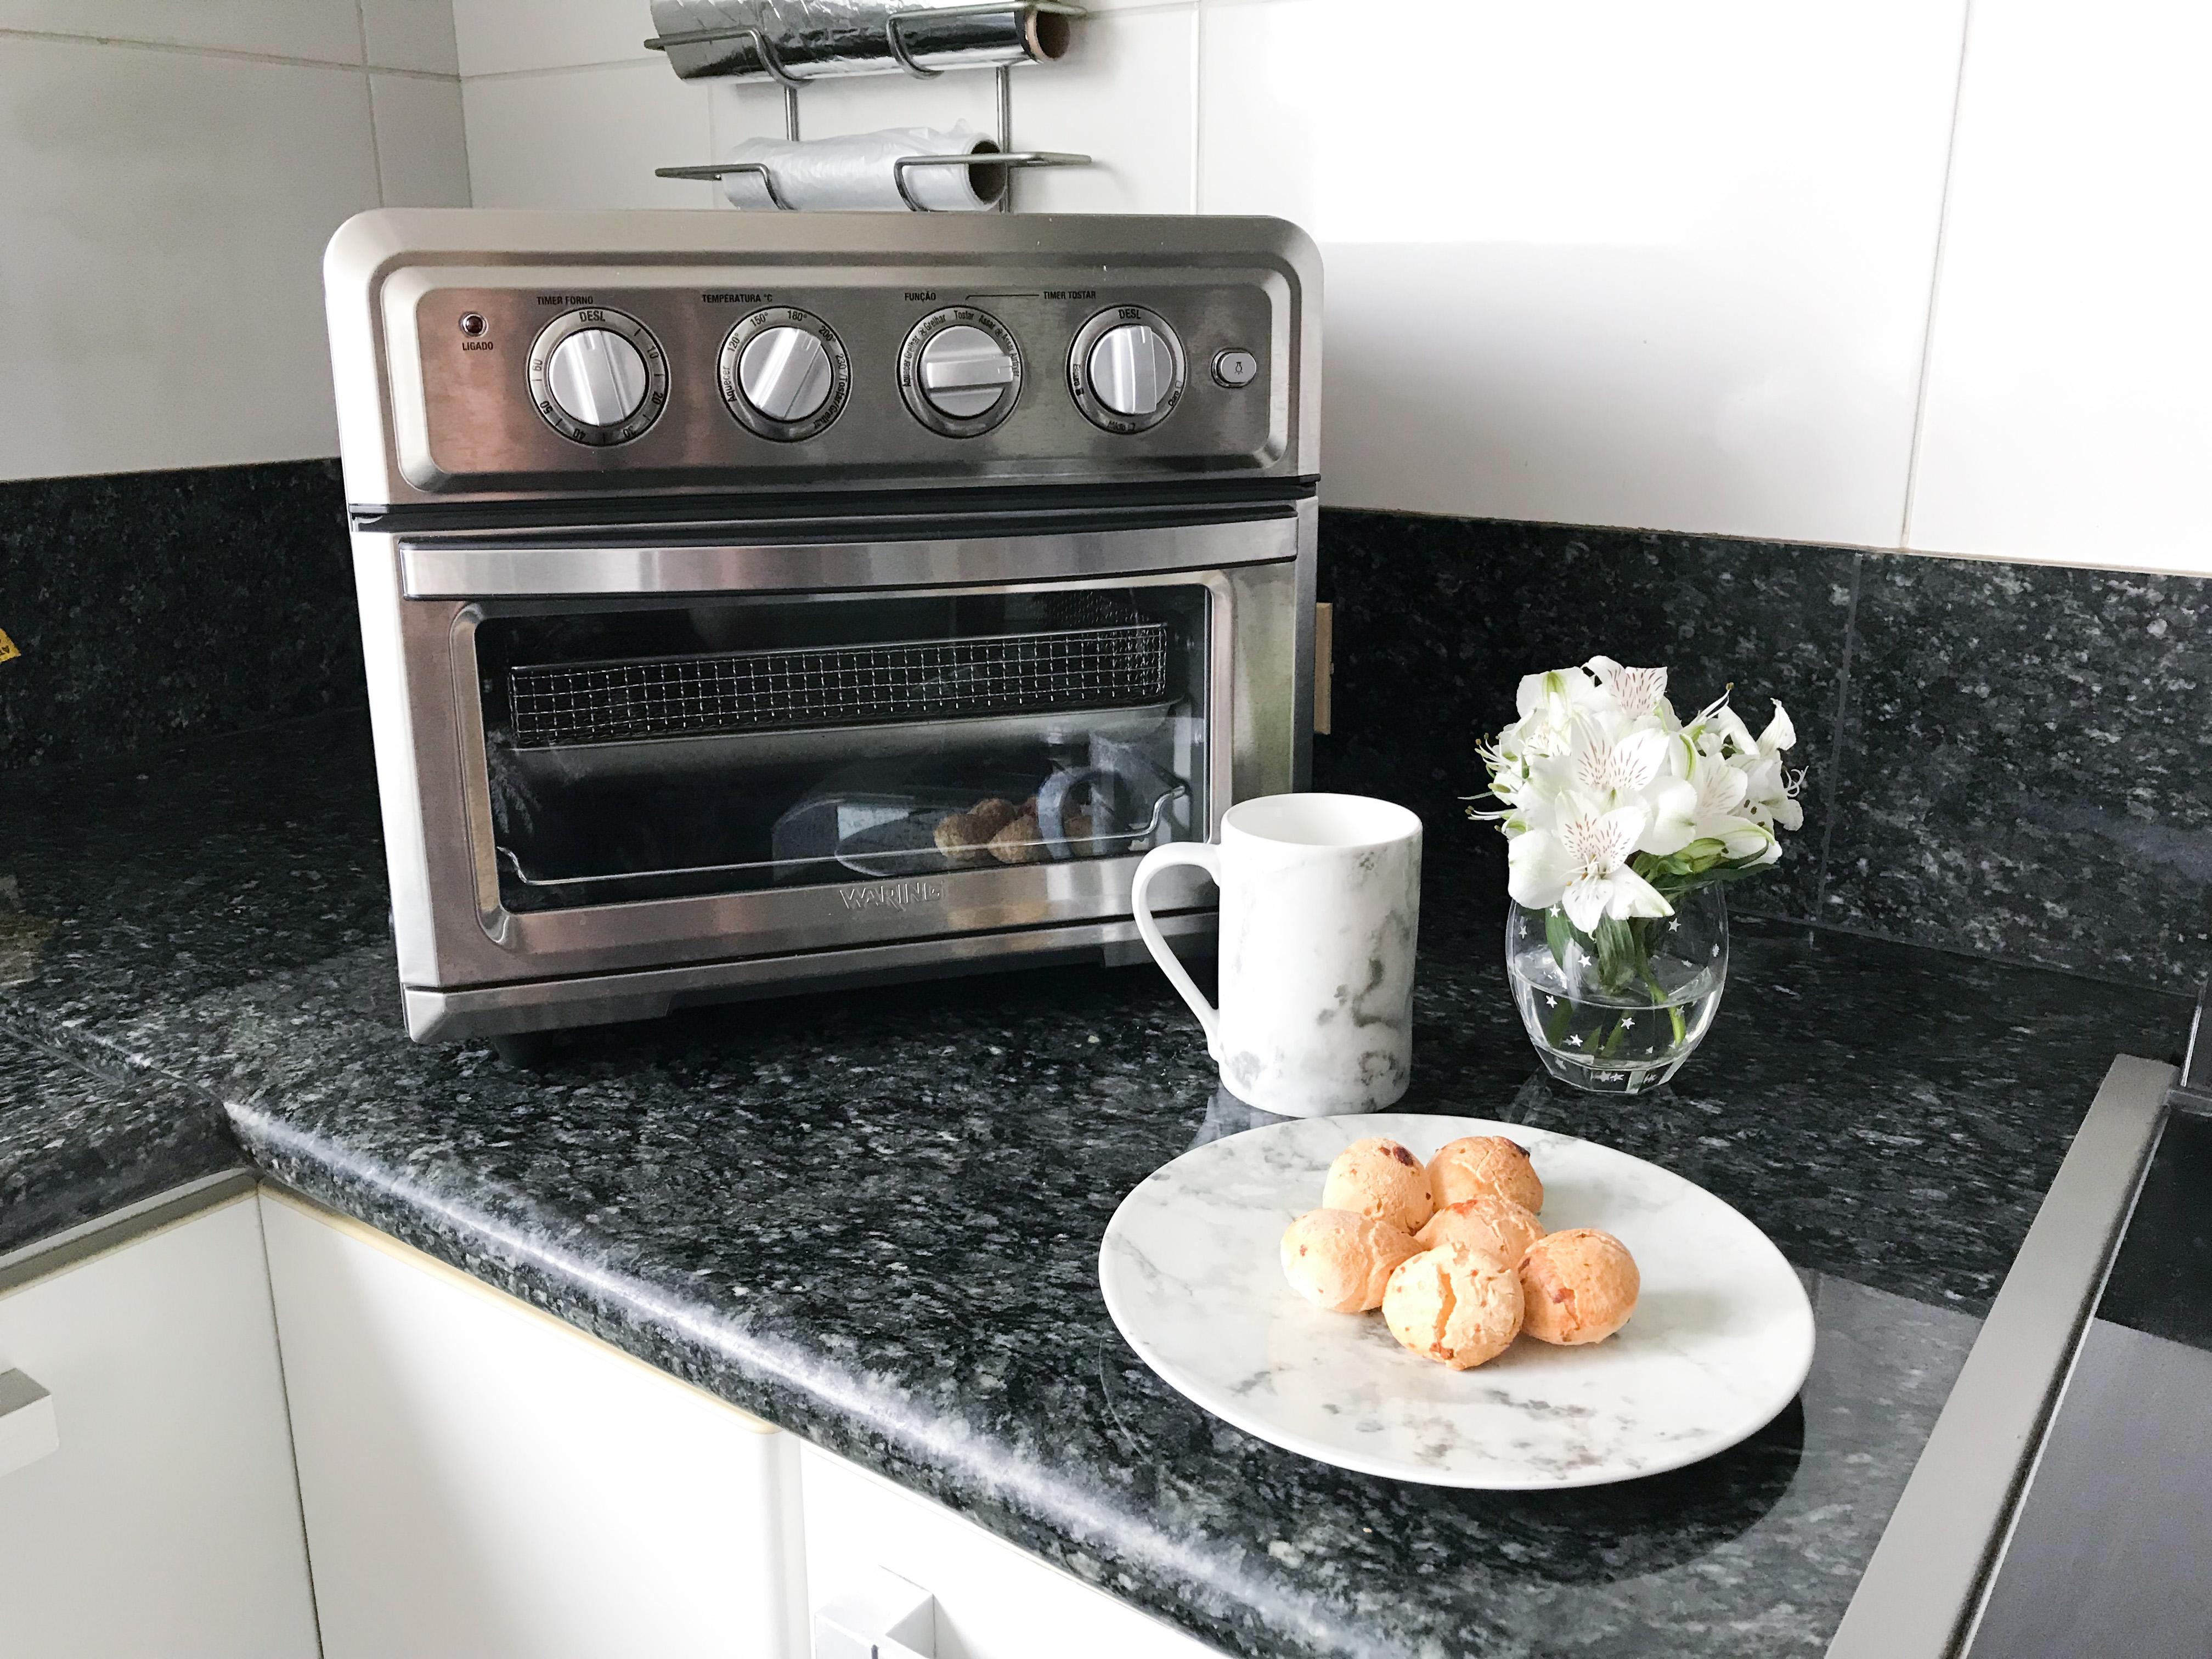 ovenfryer polishop laina laine review ovenfyer é bom